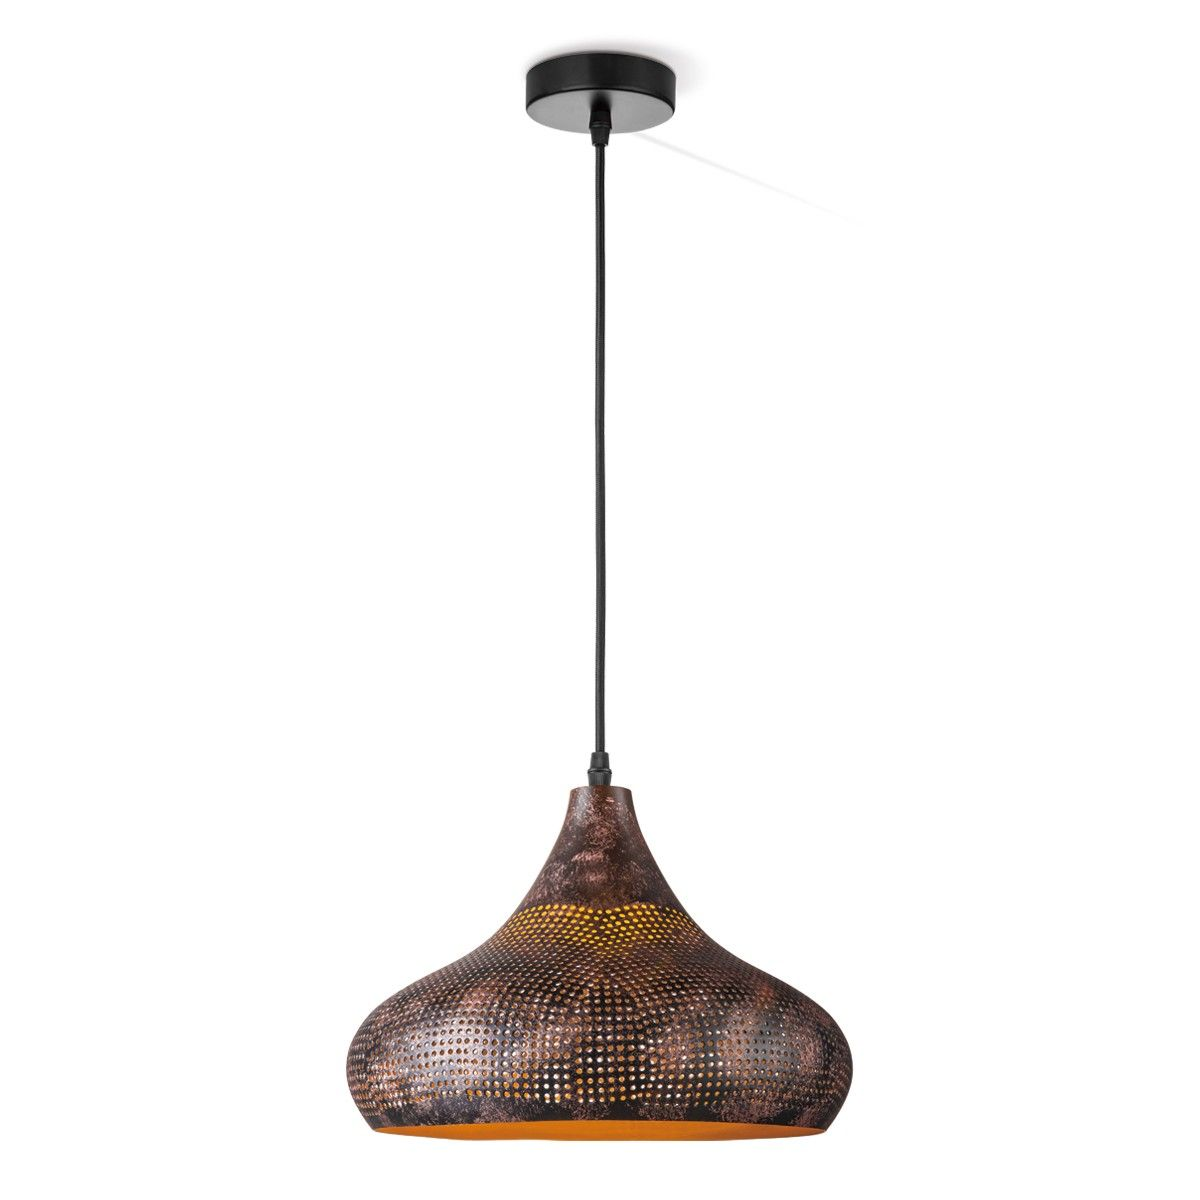 hanglamp rusty B Ø 30 cm bruin Bruin | Besselink licht | Lampen ...